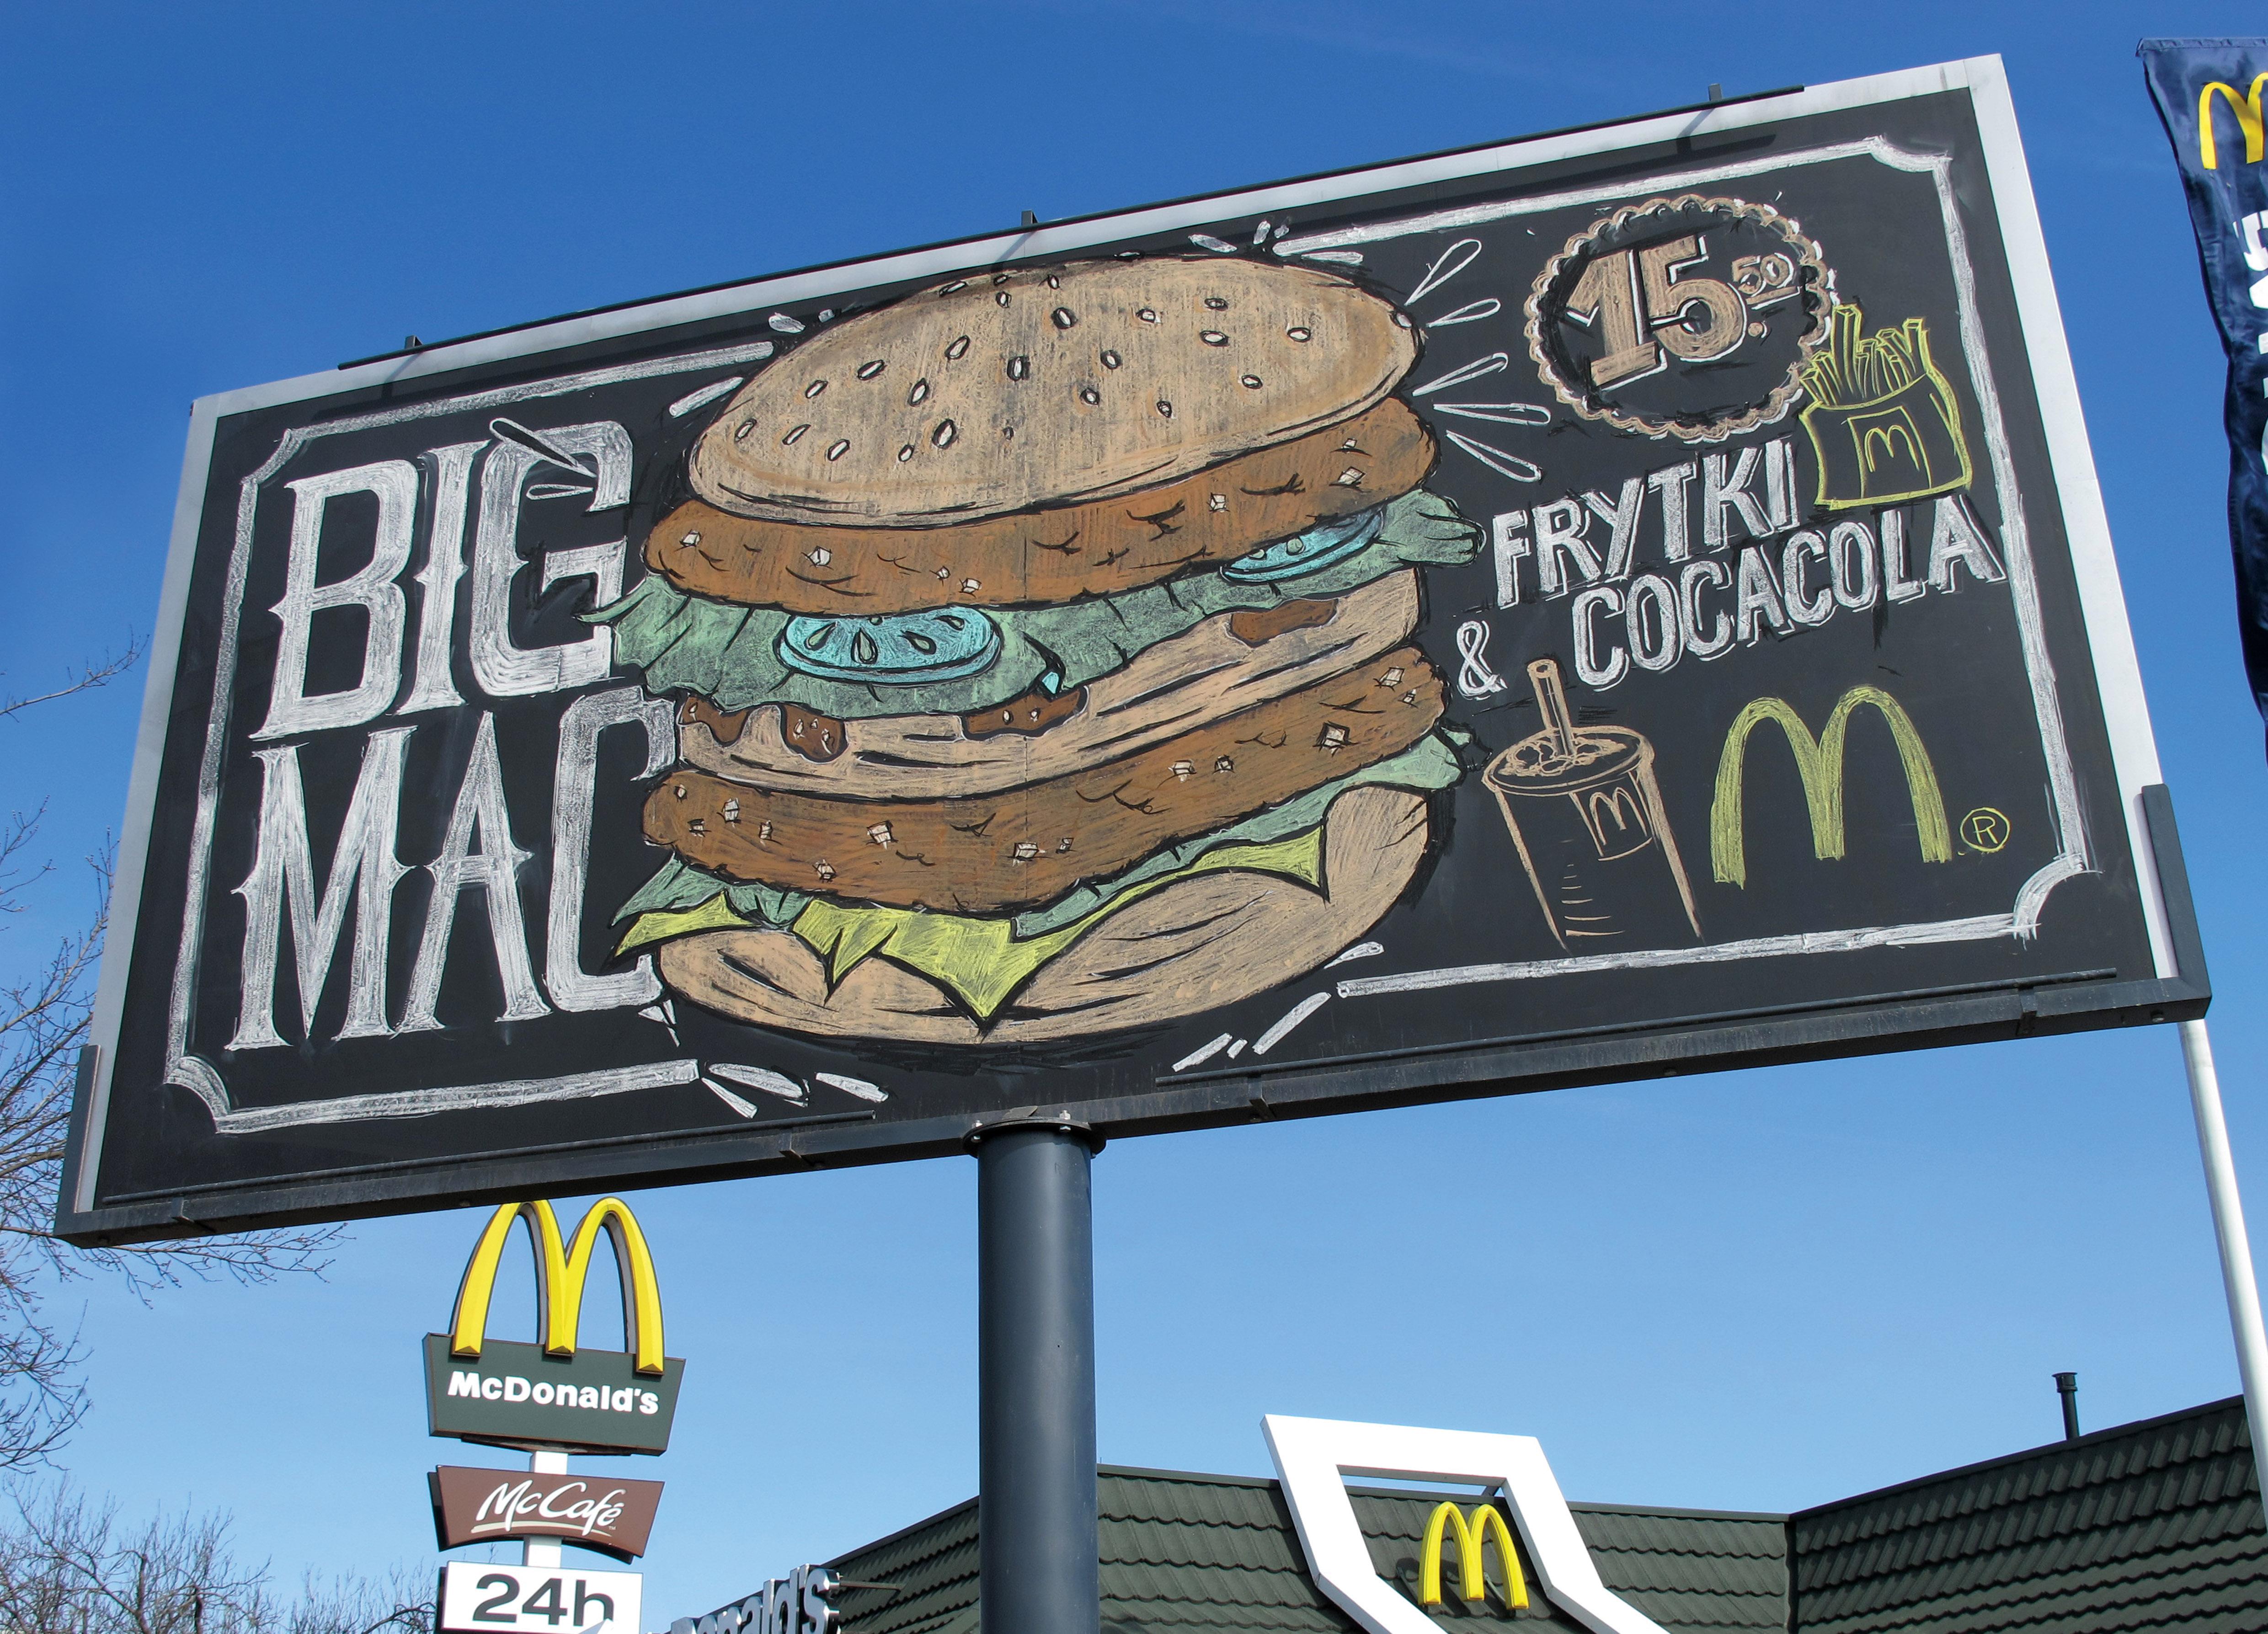 Drawn advertisement McDonald's Pinterest basics Logos Warsaw